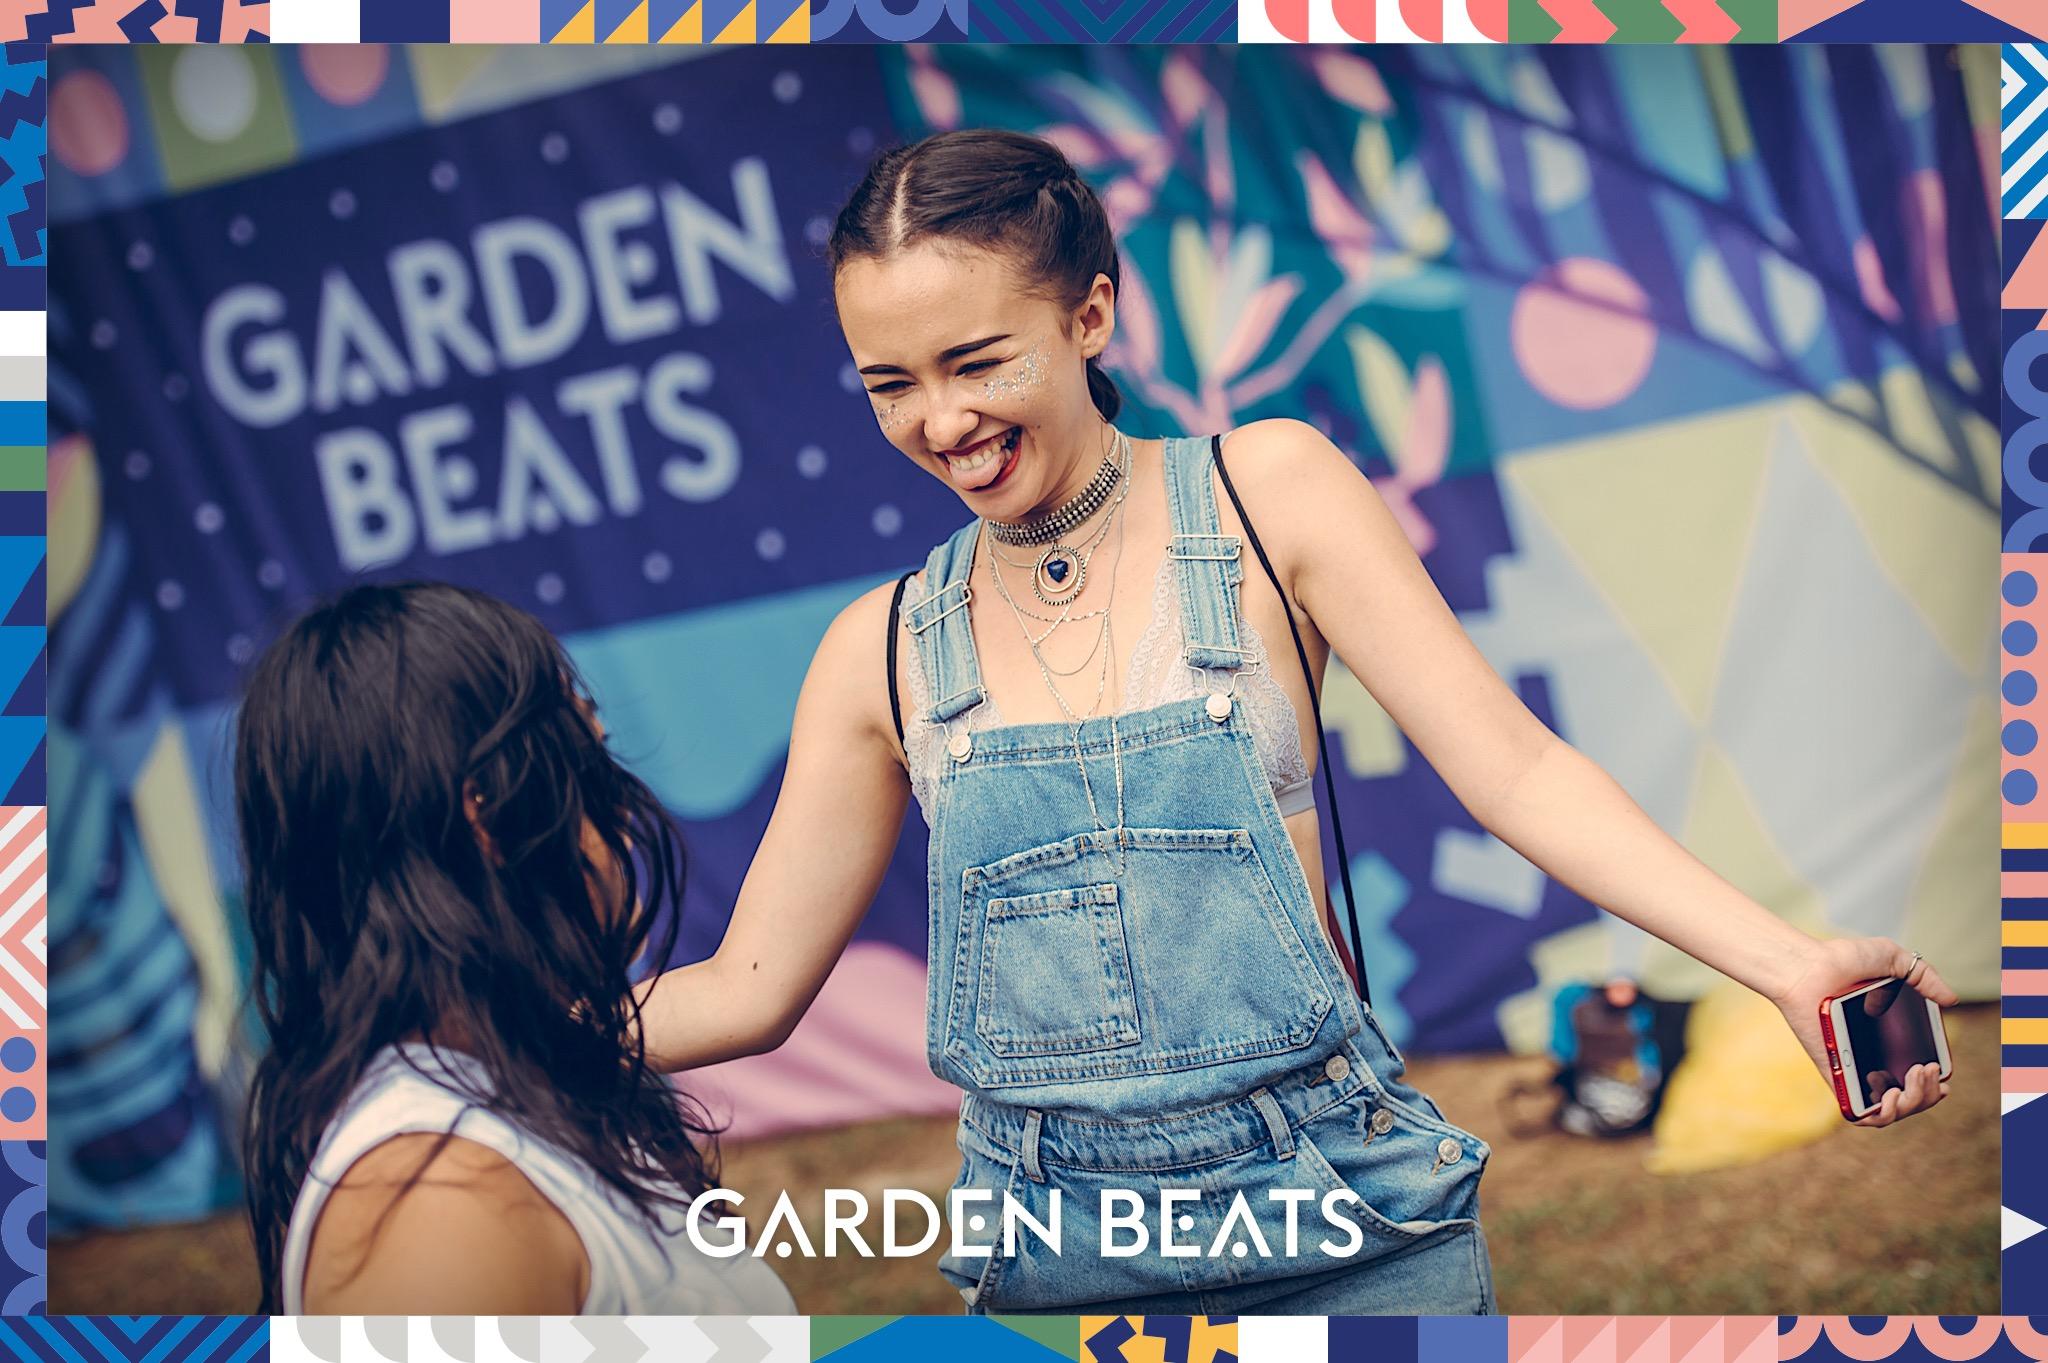 03032018_GardenBeats_Colossal569_Watermarked.jpg